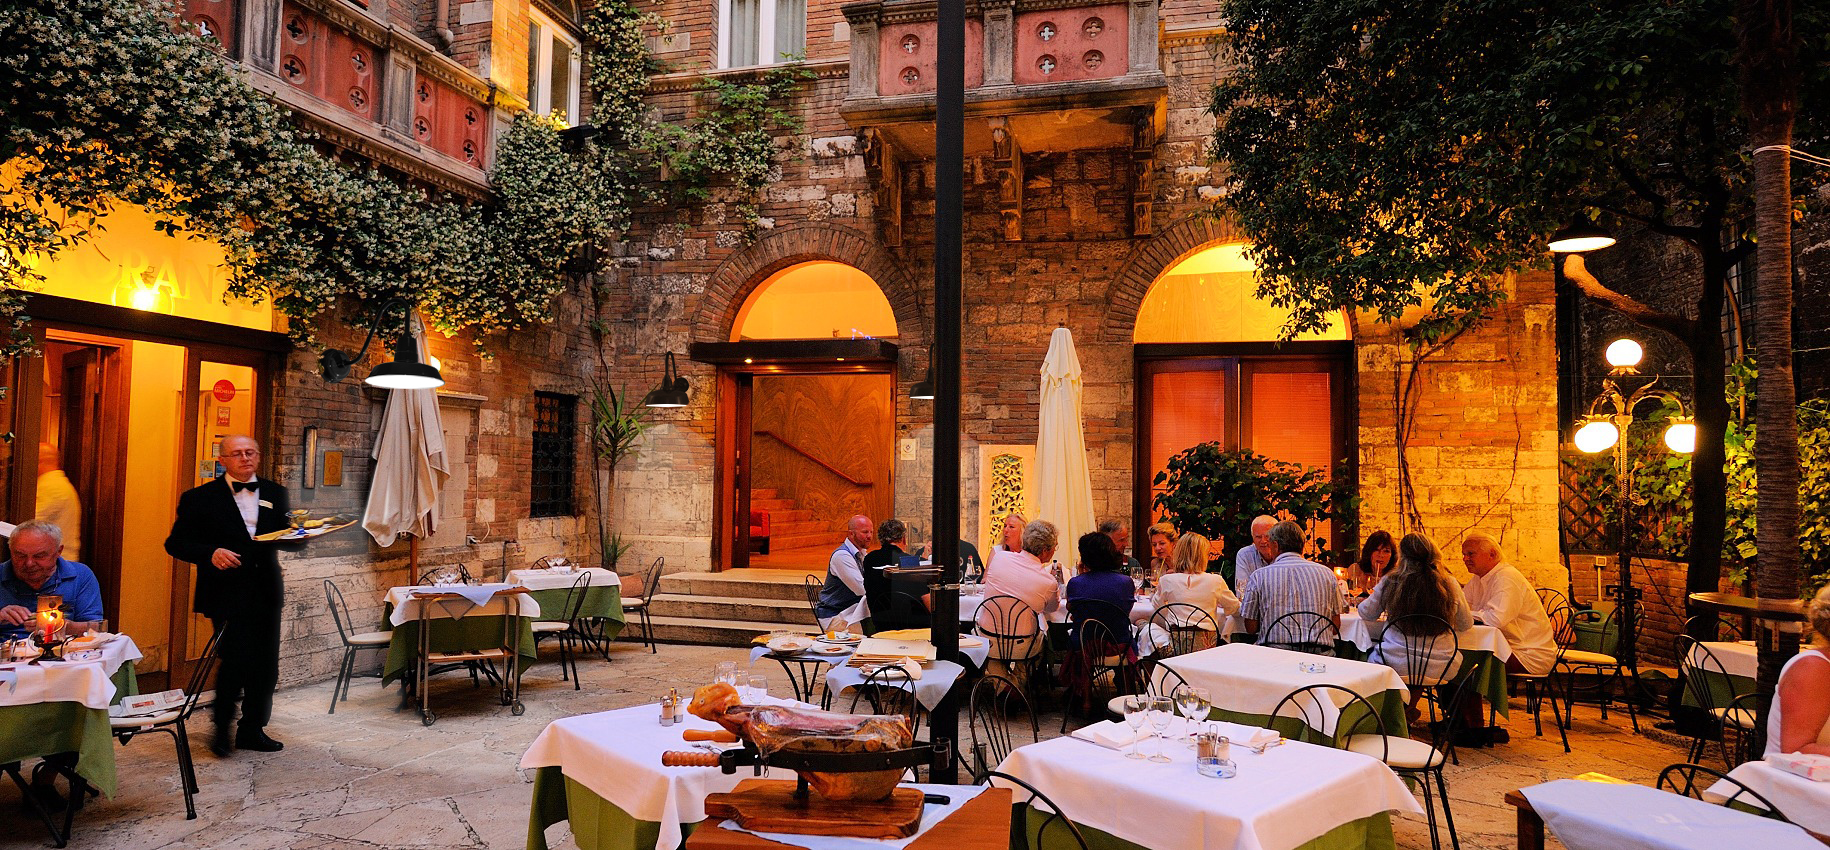 Restaurant lighting ideas for your business cocoweb restaurant lighting aloadofball Gallery